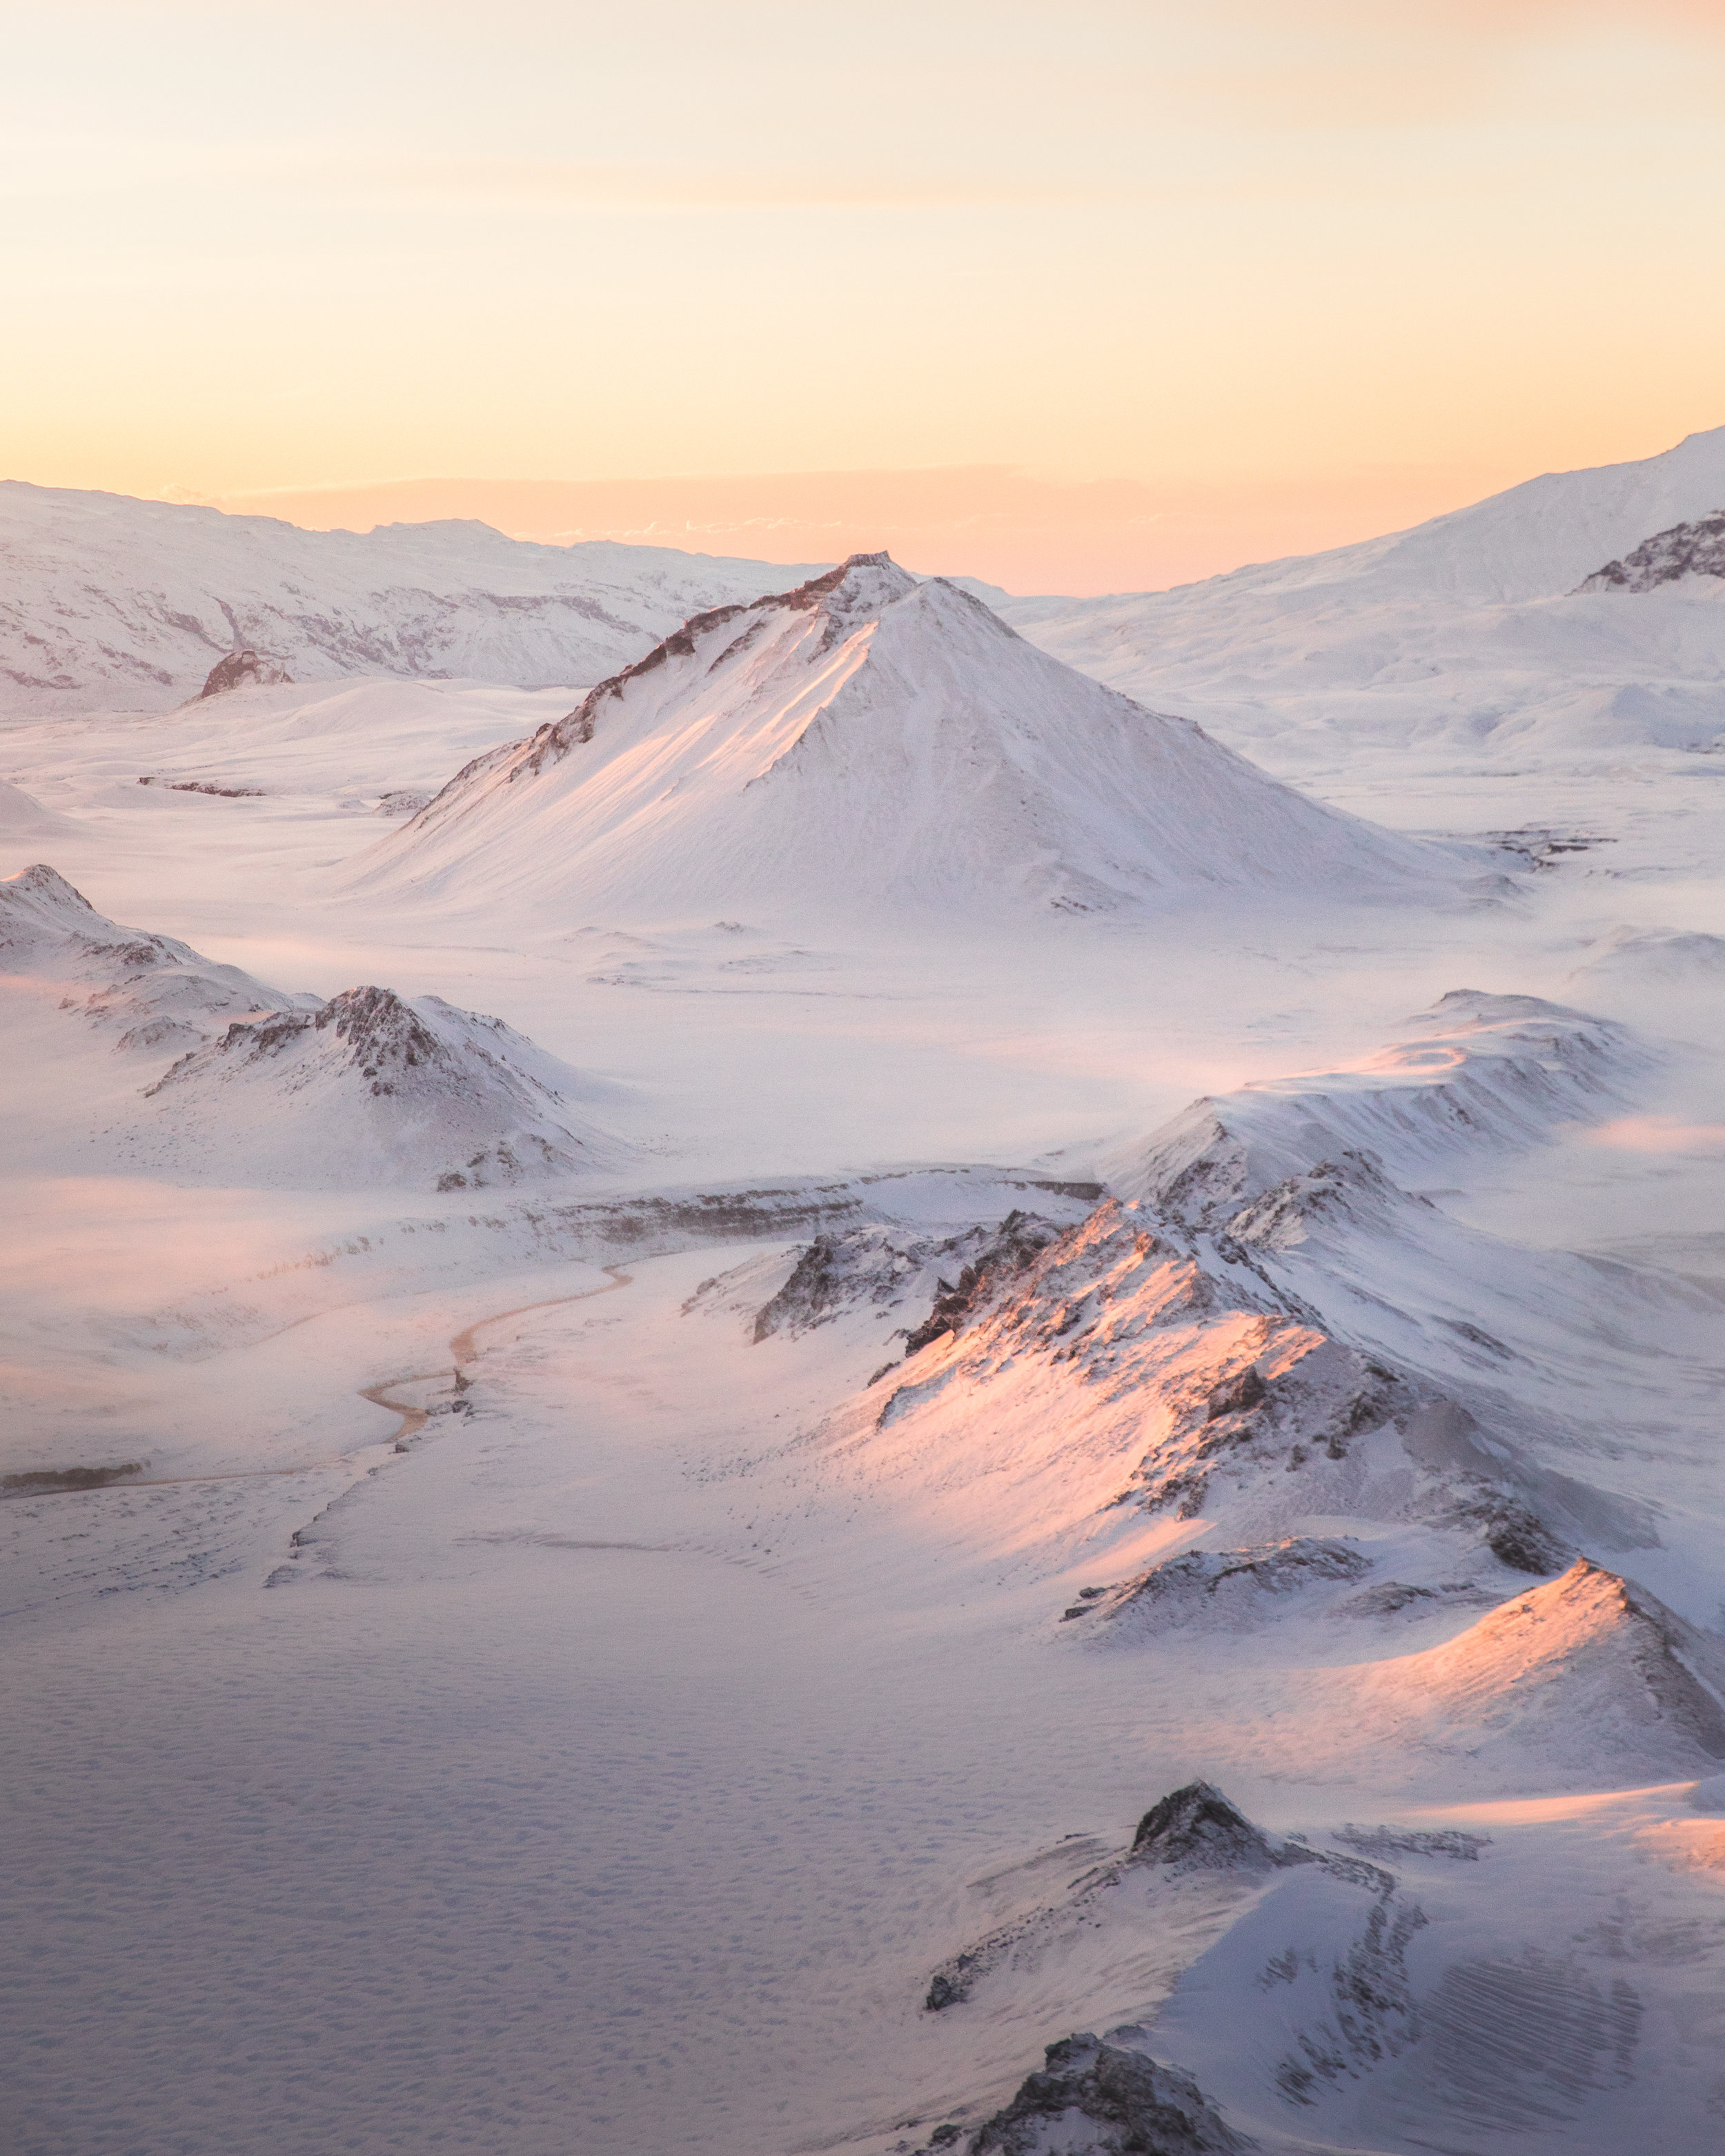 iceland_volc_sunset3.jpg